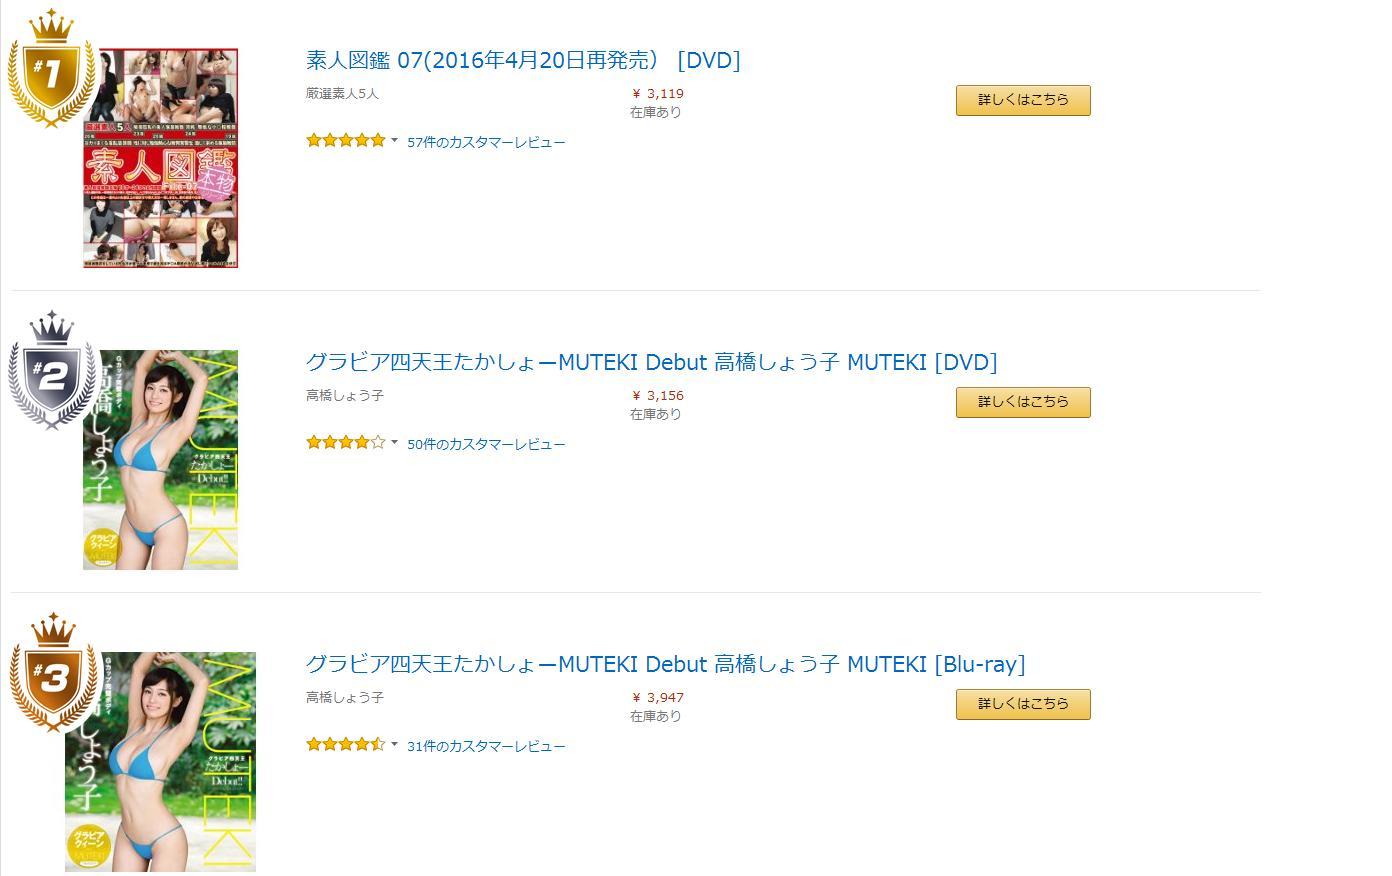 AmazonのAV売上ランキング(1位が新田恵海の素人図鑑、2位3位が高橋しょう子のMUTEKI Debut)